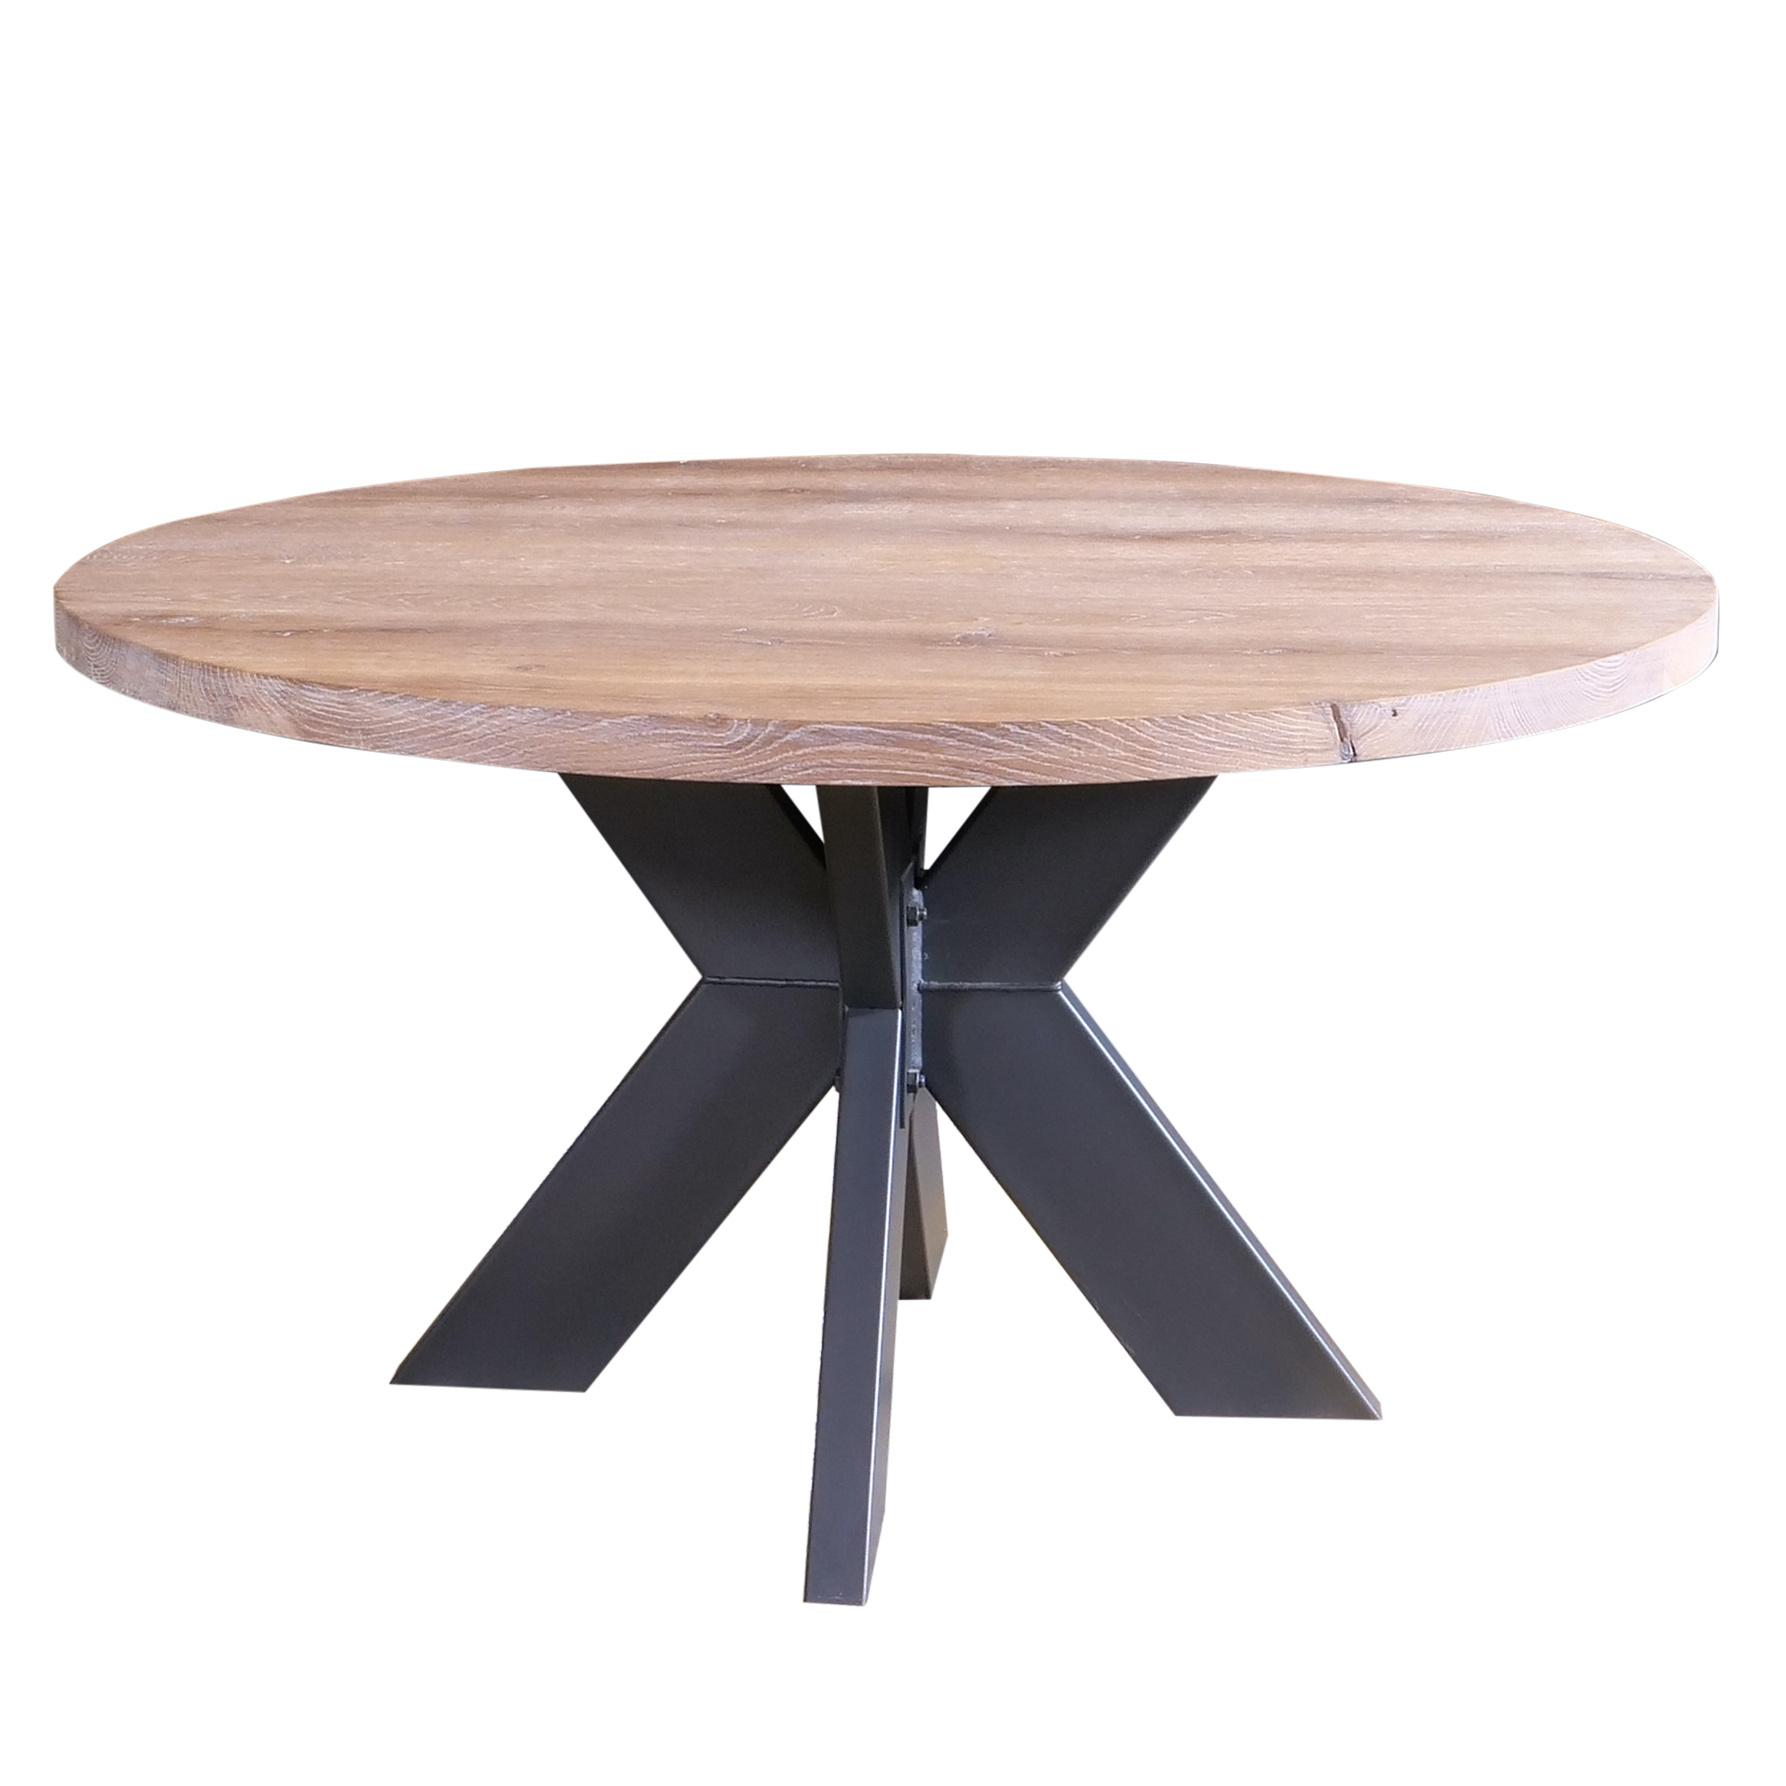 Eiken (horeca) tafelblad rond - 4 cm dik (1-laag) - diverse afmetingen - rustiek Europees eikenhout GEBORSTELD - verlijmd kd 10-12%